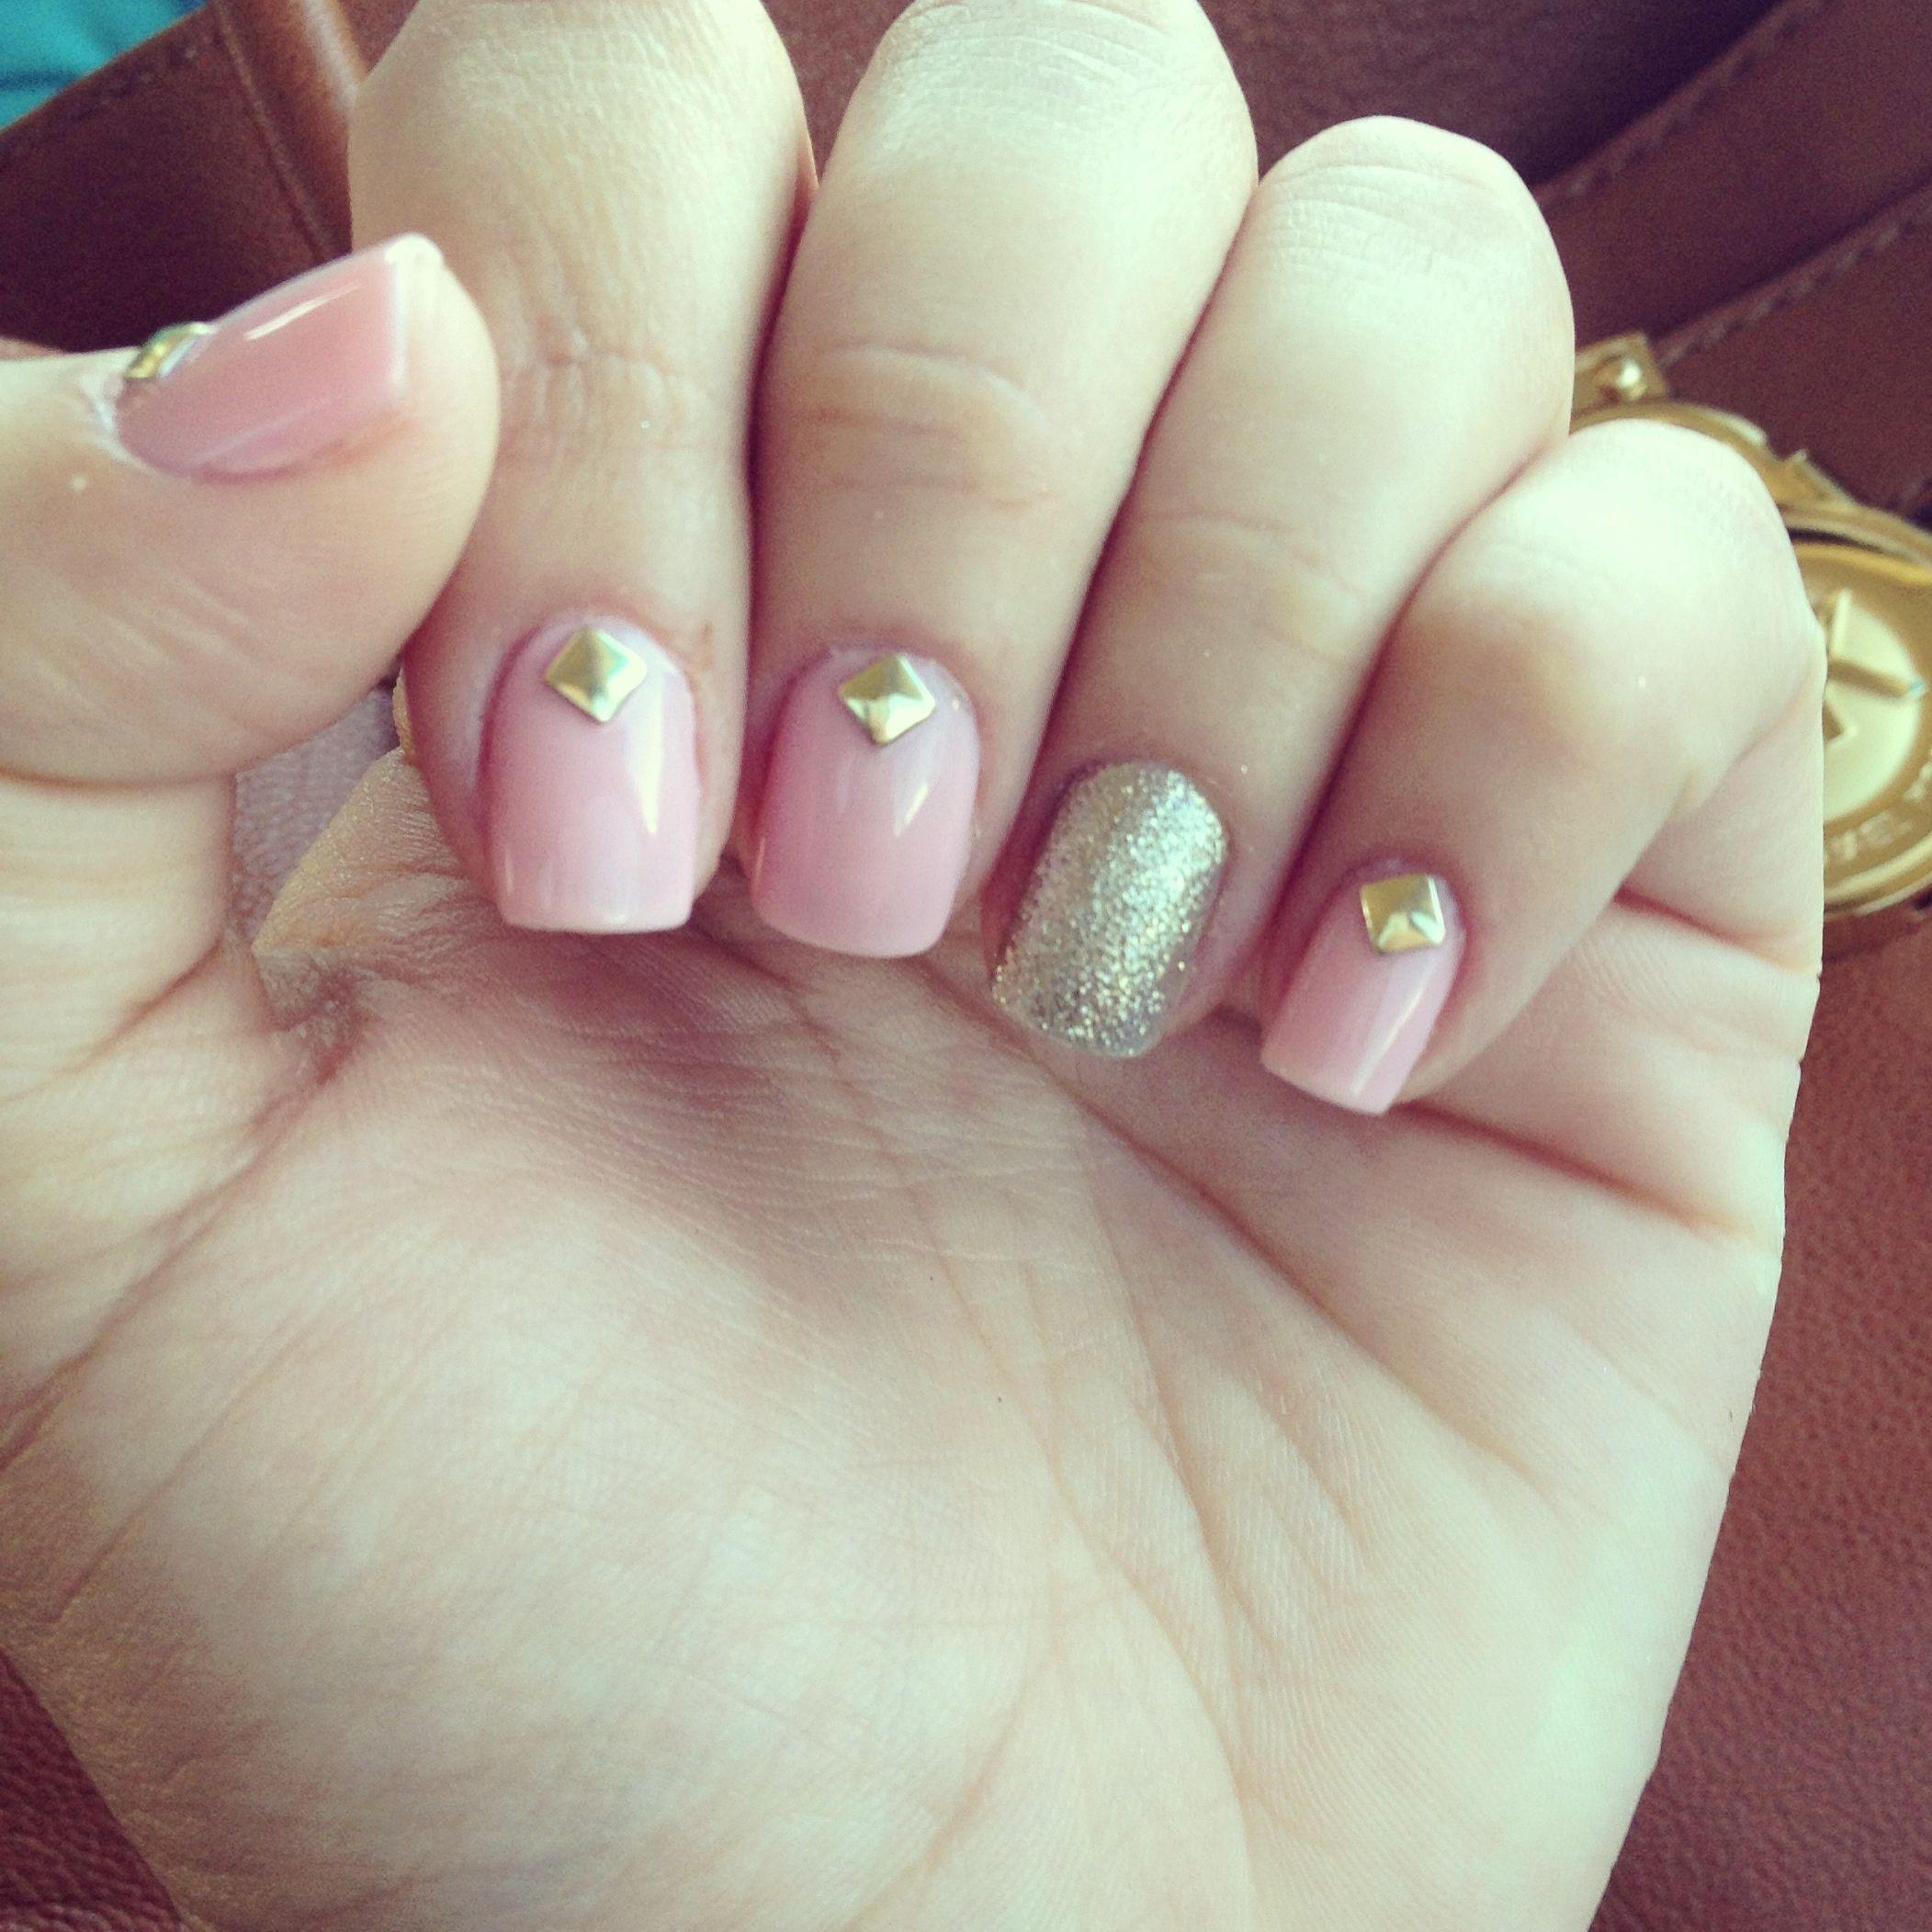 Nails cute nailart blingbling girls summer color classy chiq